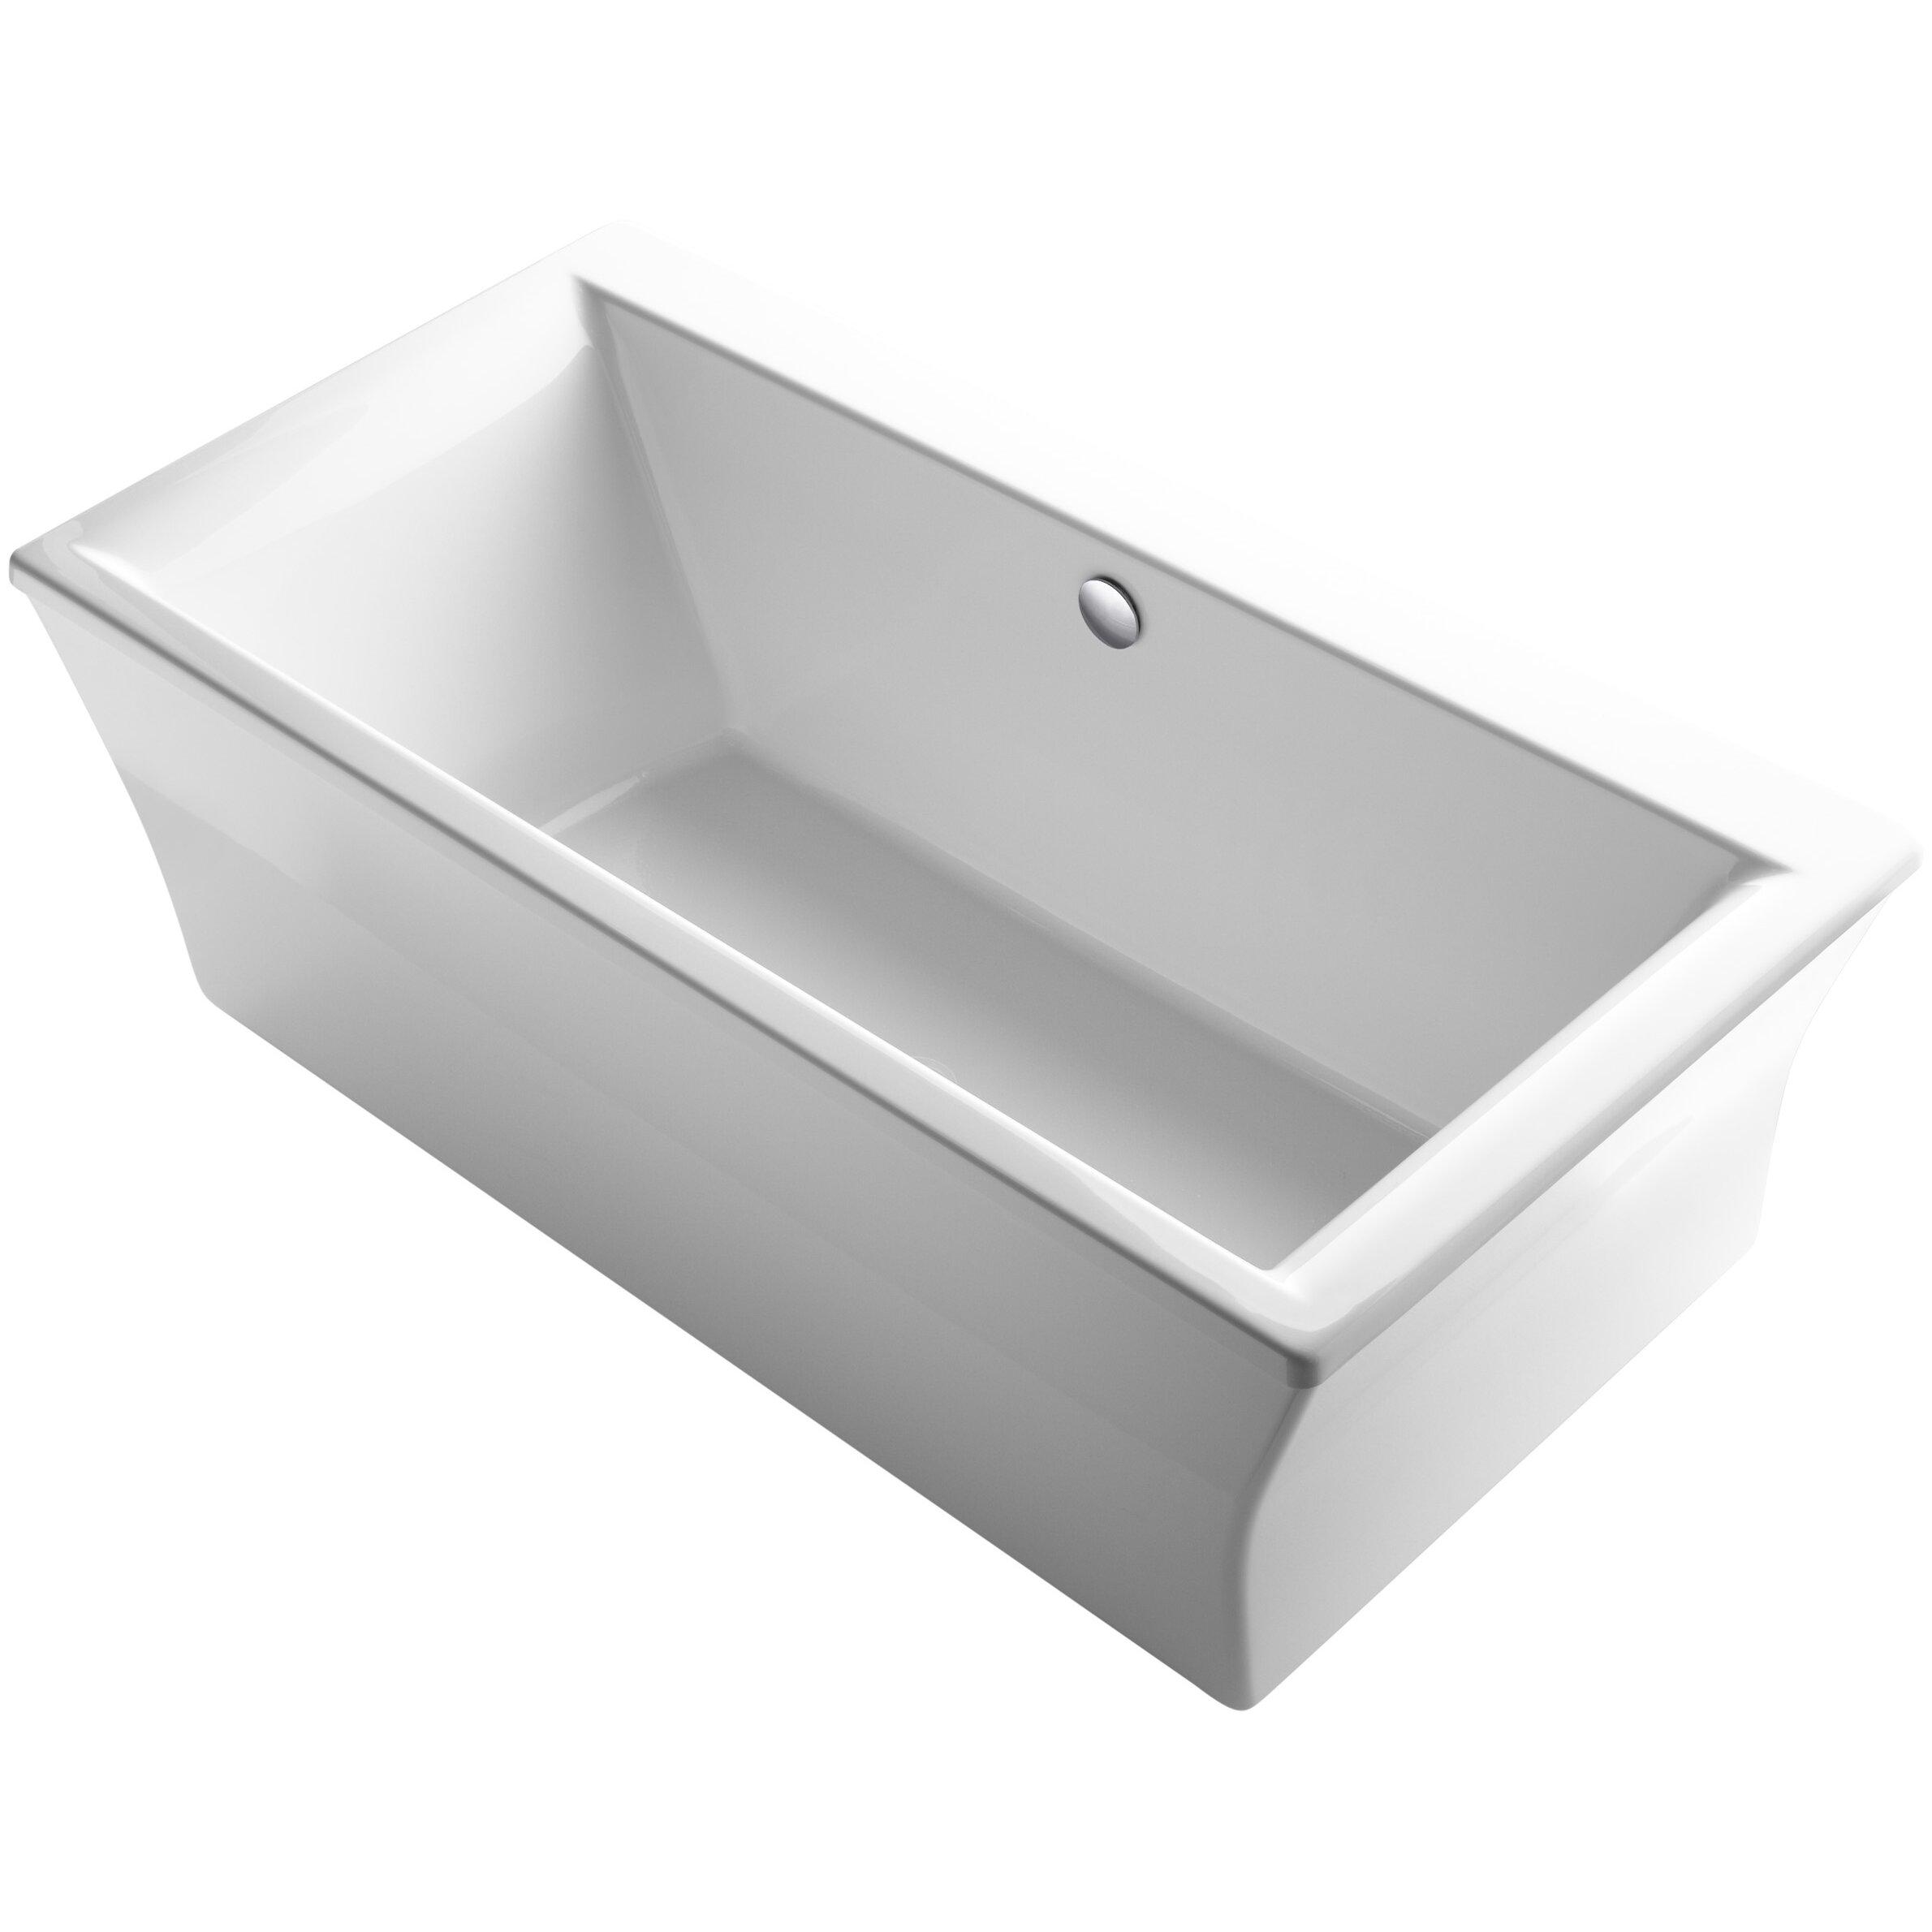 Kohler Stargaze Freestanding  X  Soaking Bathtub  Reviews - Freestanding tub end drain